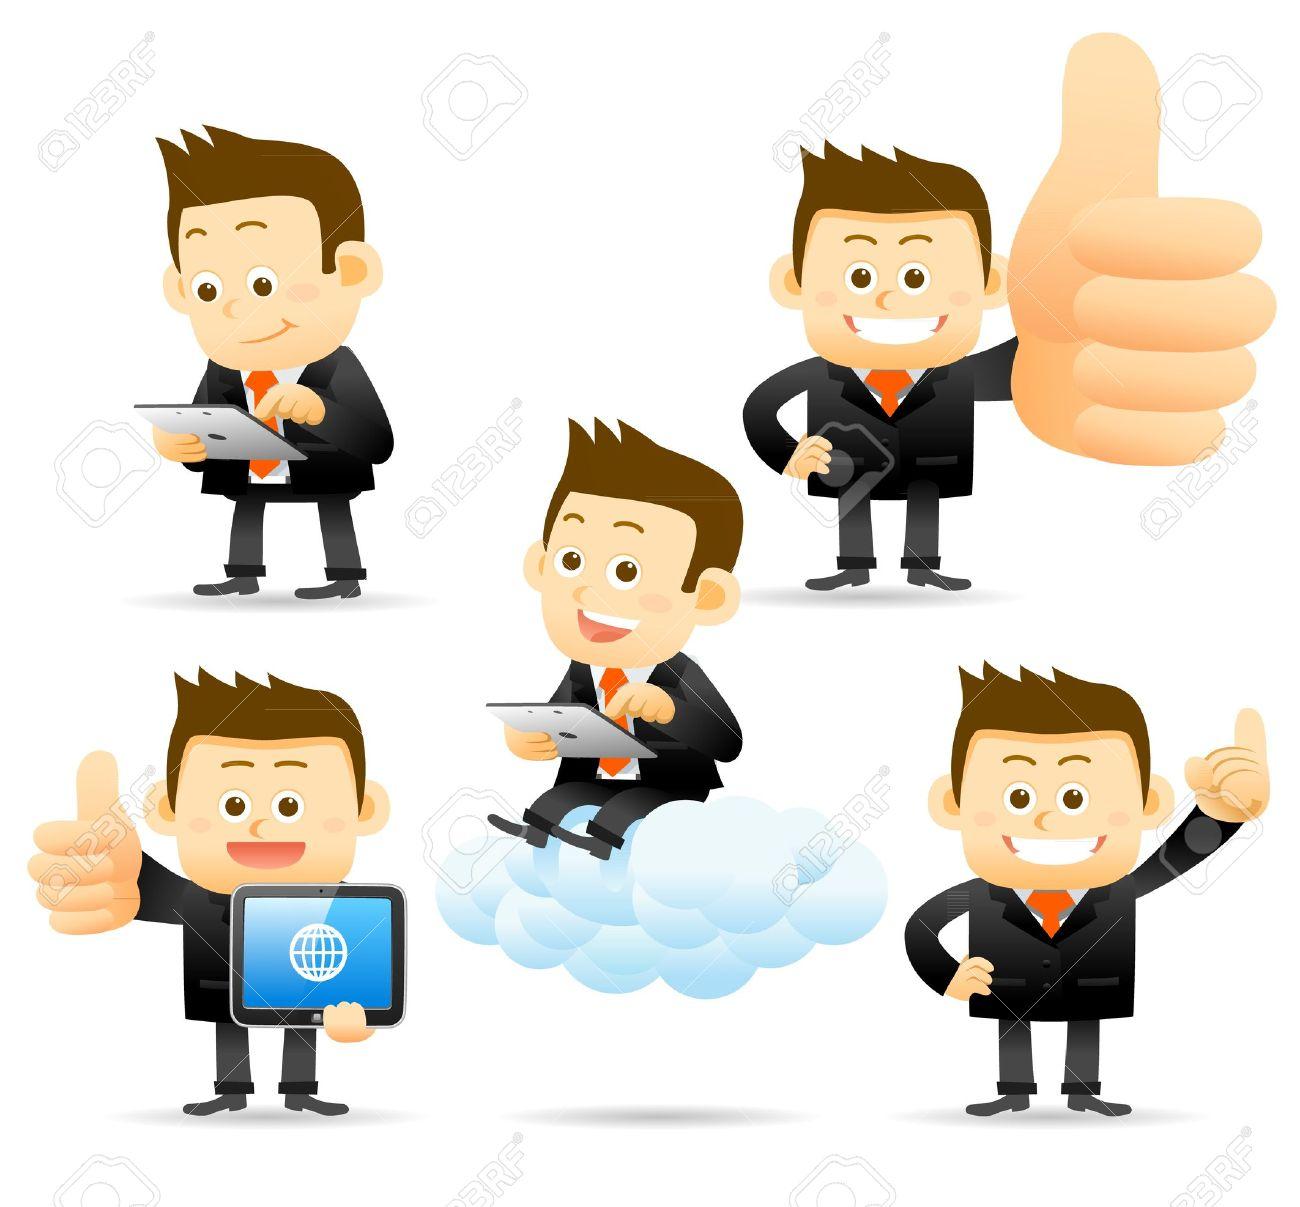 Elegant People Series - Business man ,Cloud computing concept - 13543863